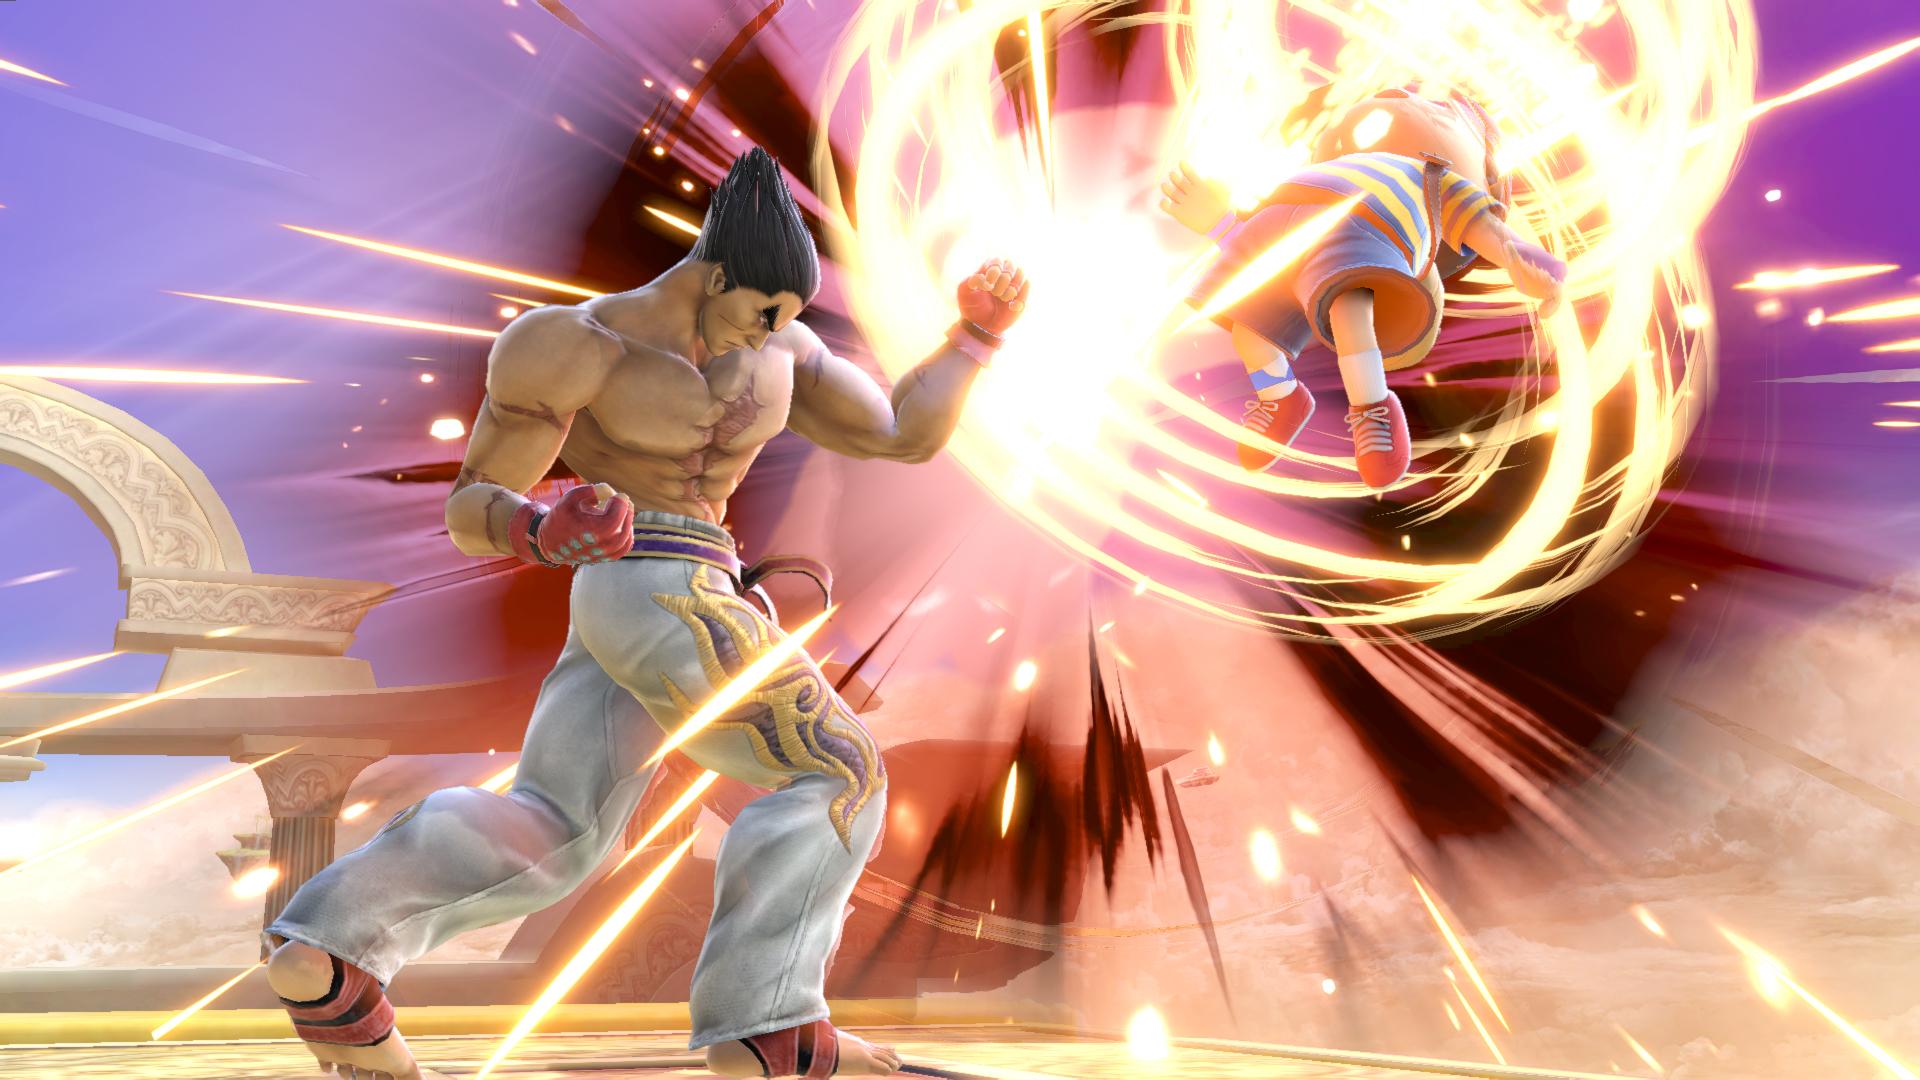 Kazuya Mishima coming to Super Smash Bros. Ultimate on June 29